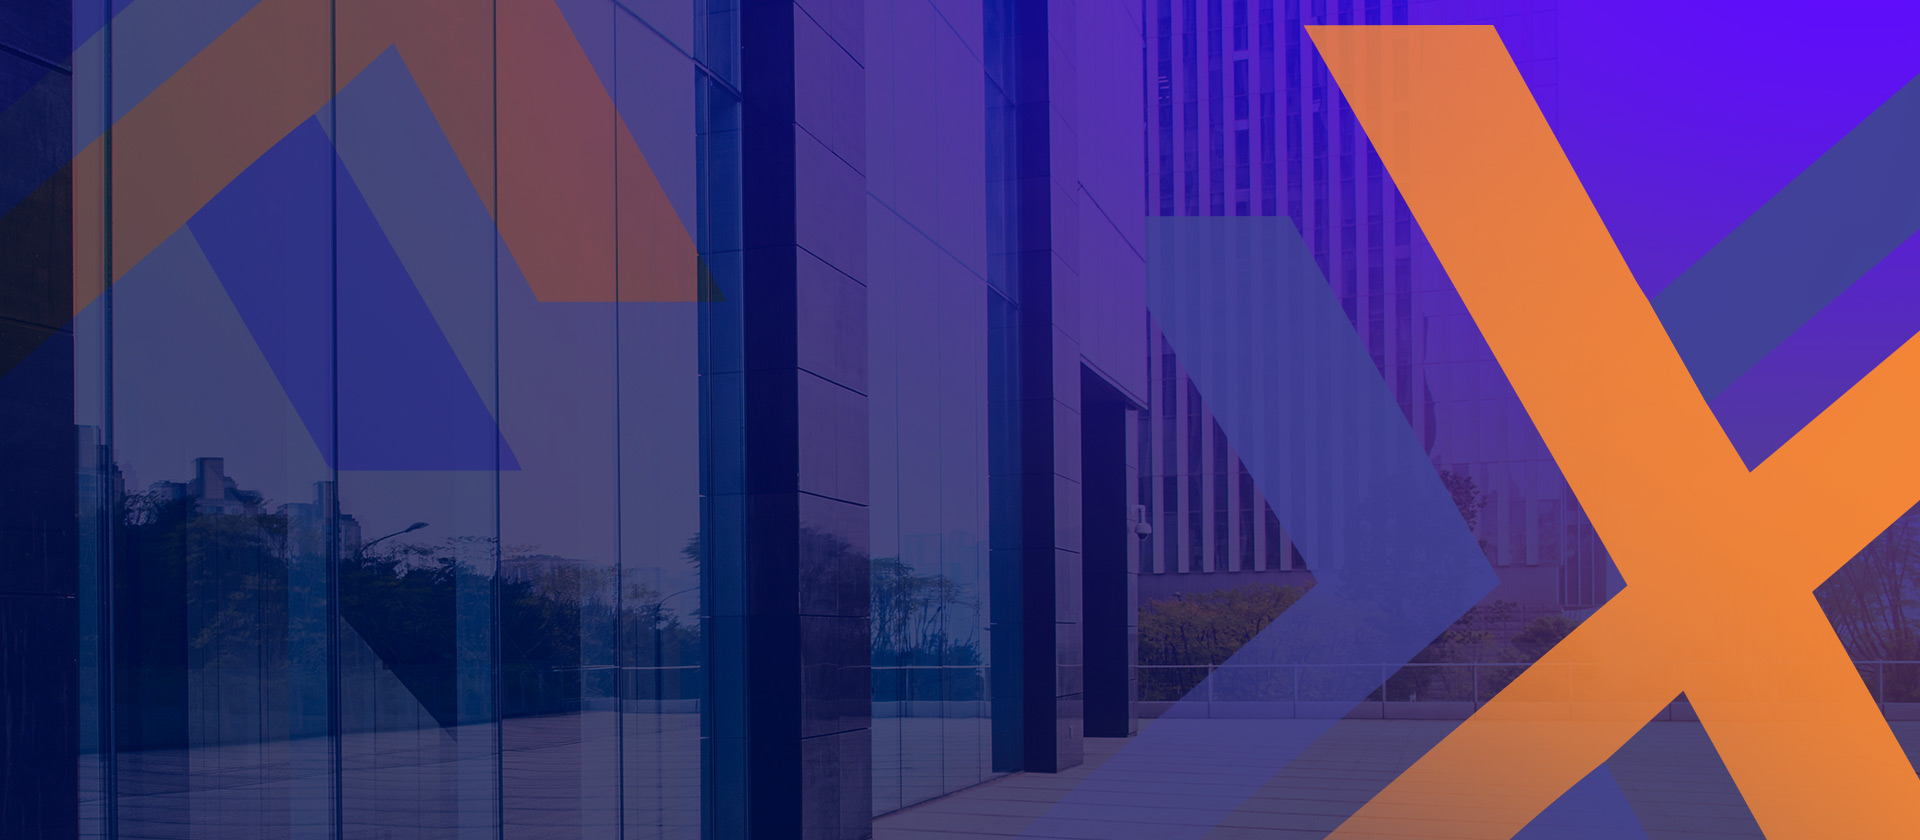 Rapidex Vidros </br> Distribuidora de Vidros e Acessórios